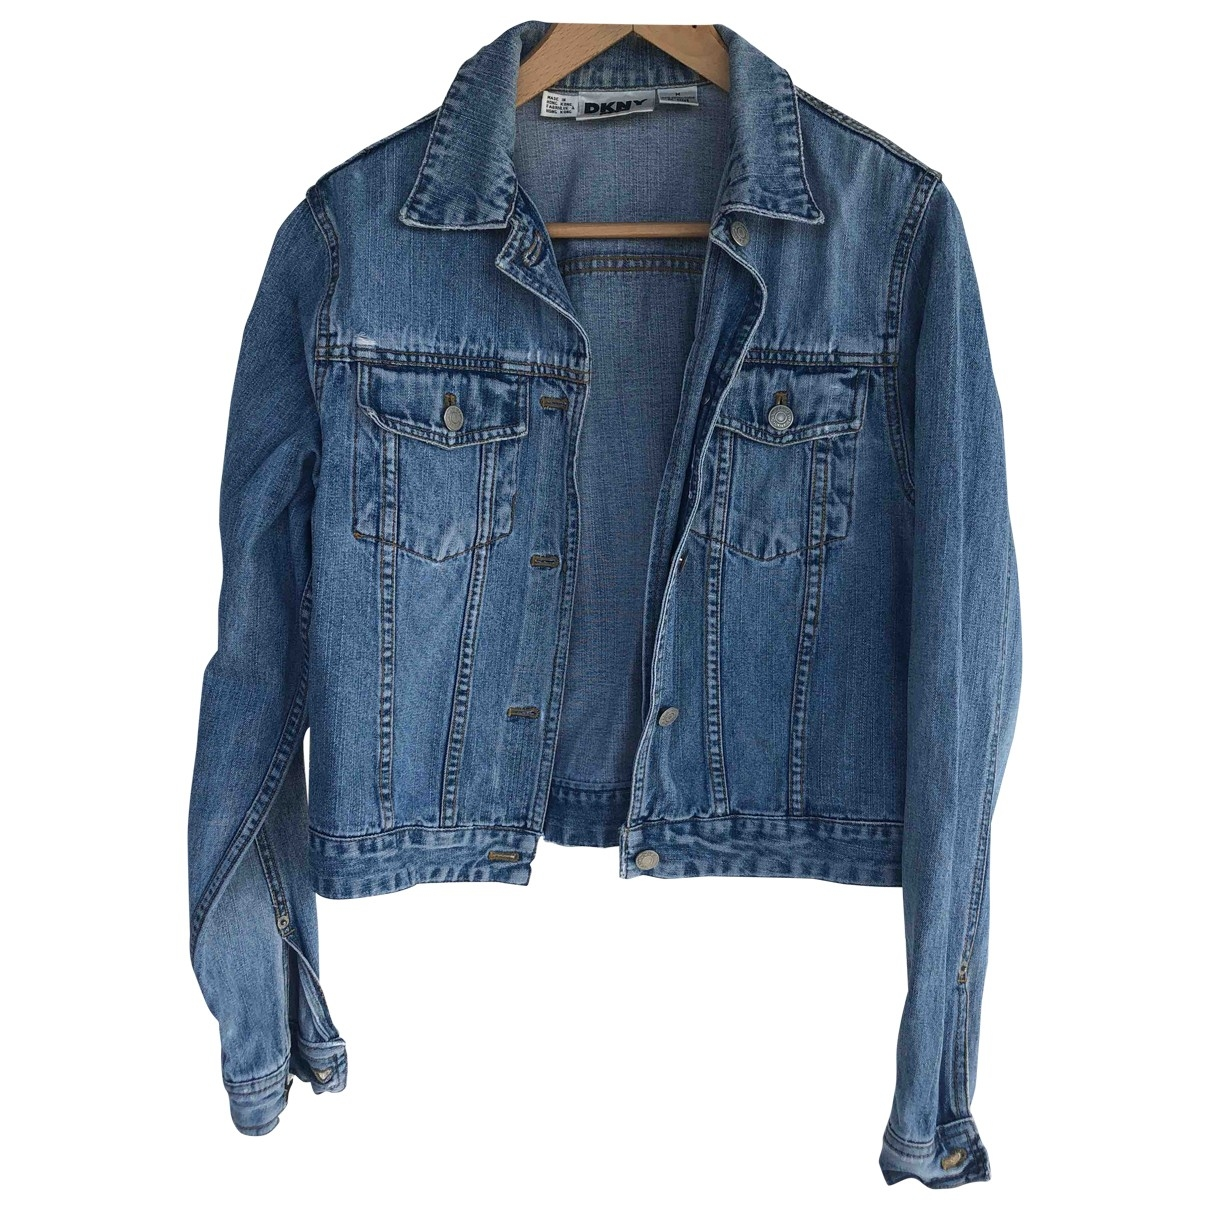 Dkny \N Jacke in  Blau Denim - Jeans